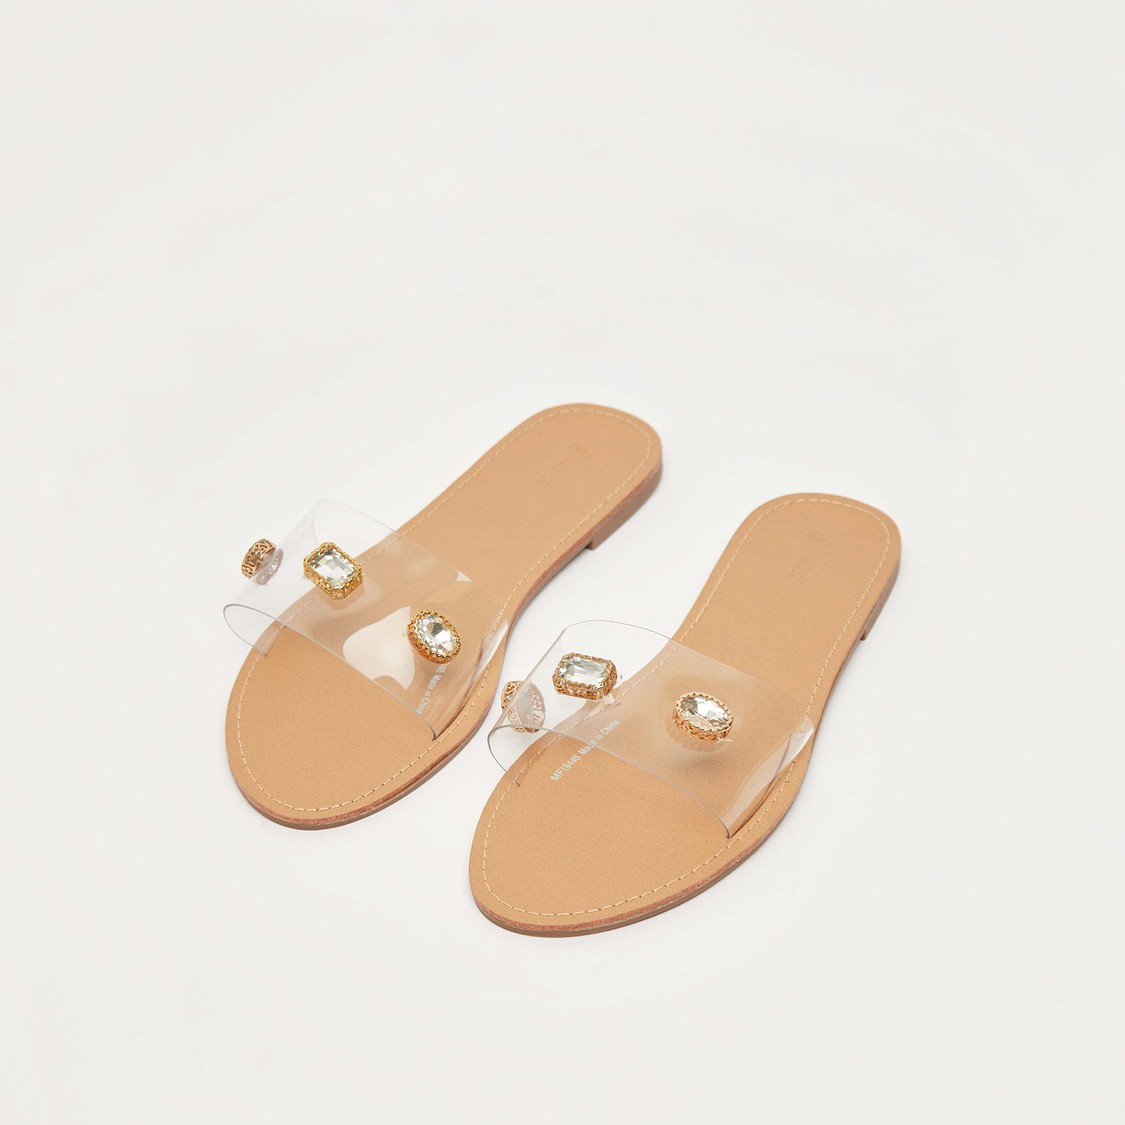 Stud Detail Slip-On Flat Sandals with Transparent Vamp